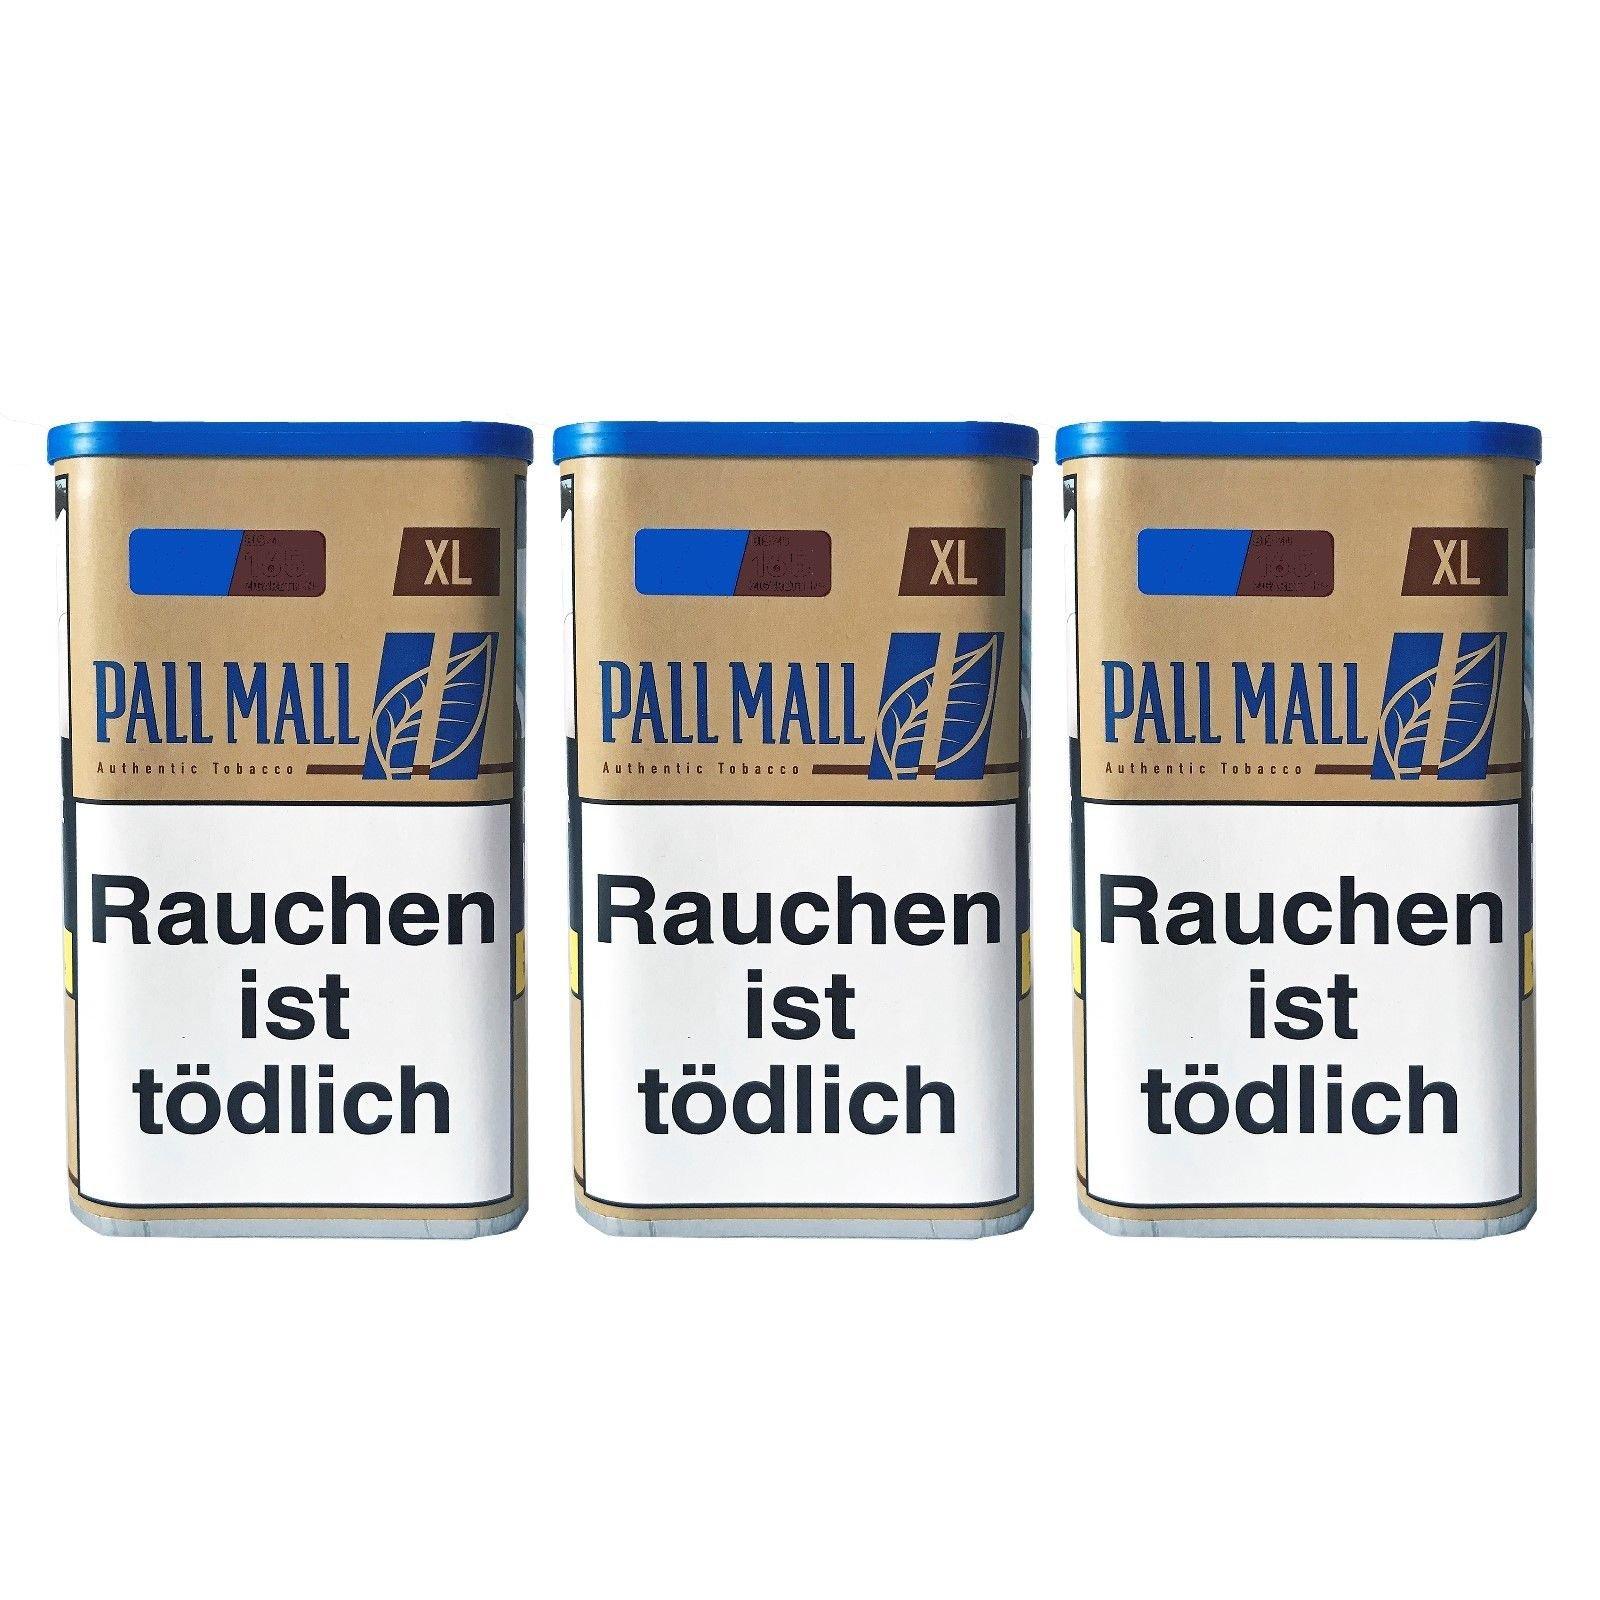 3x Pall Mall Authentic Blue / Blau XL Dose Zigarettentabak/Stopftabak Inhalt 60 g